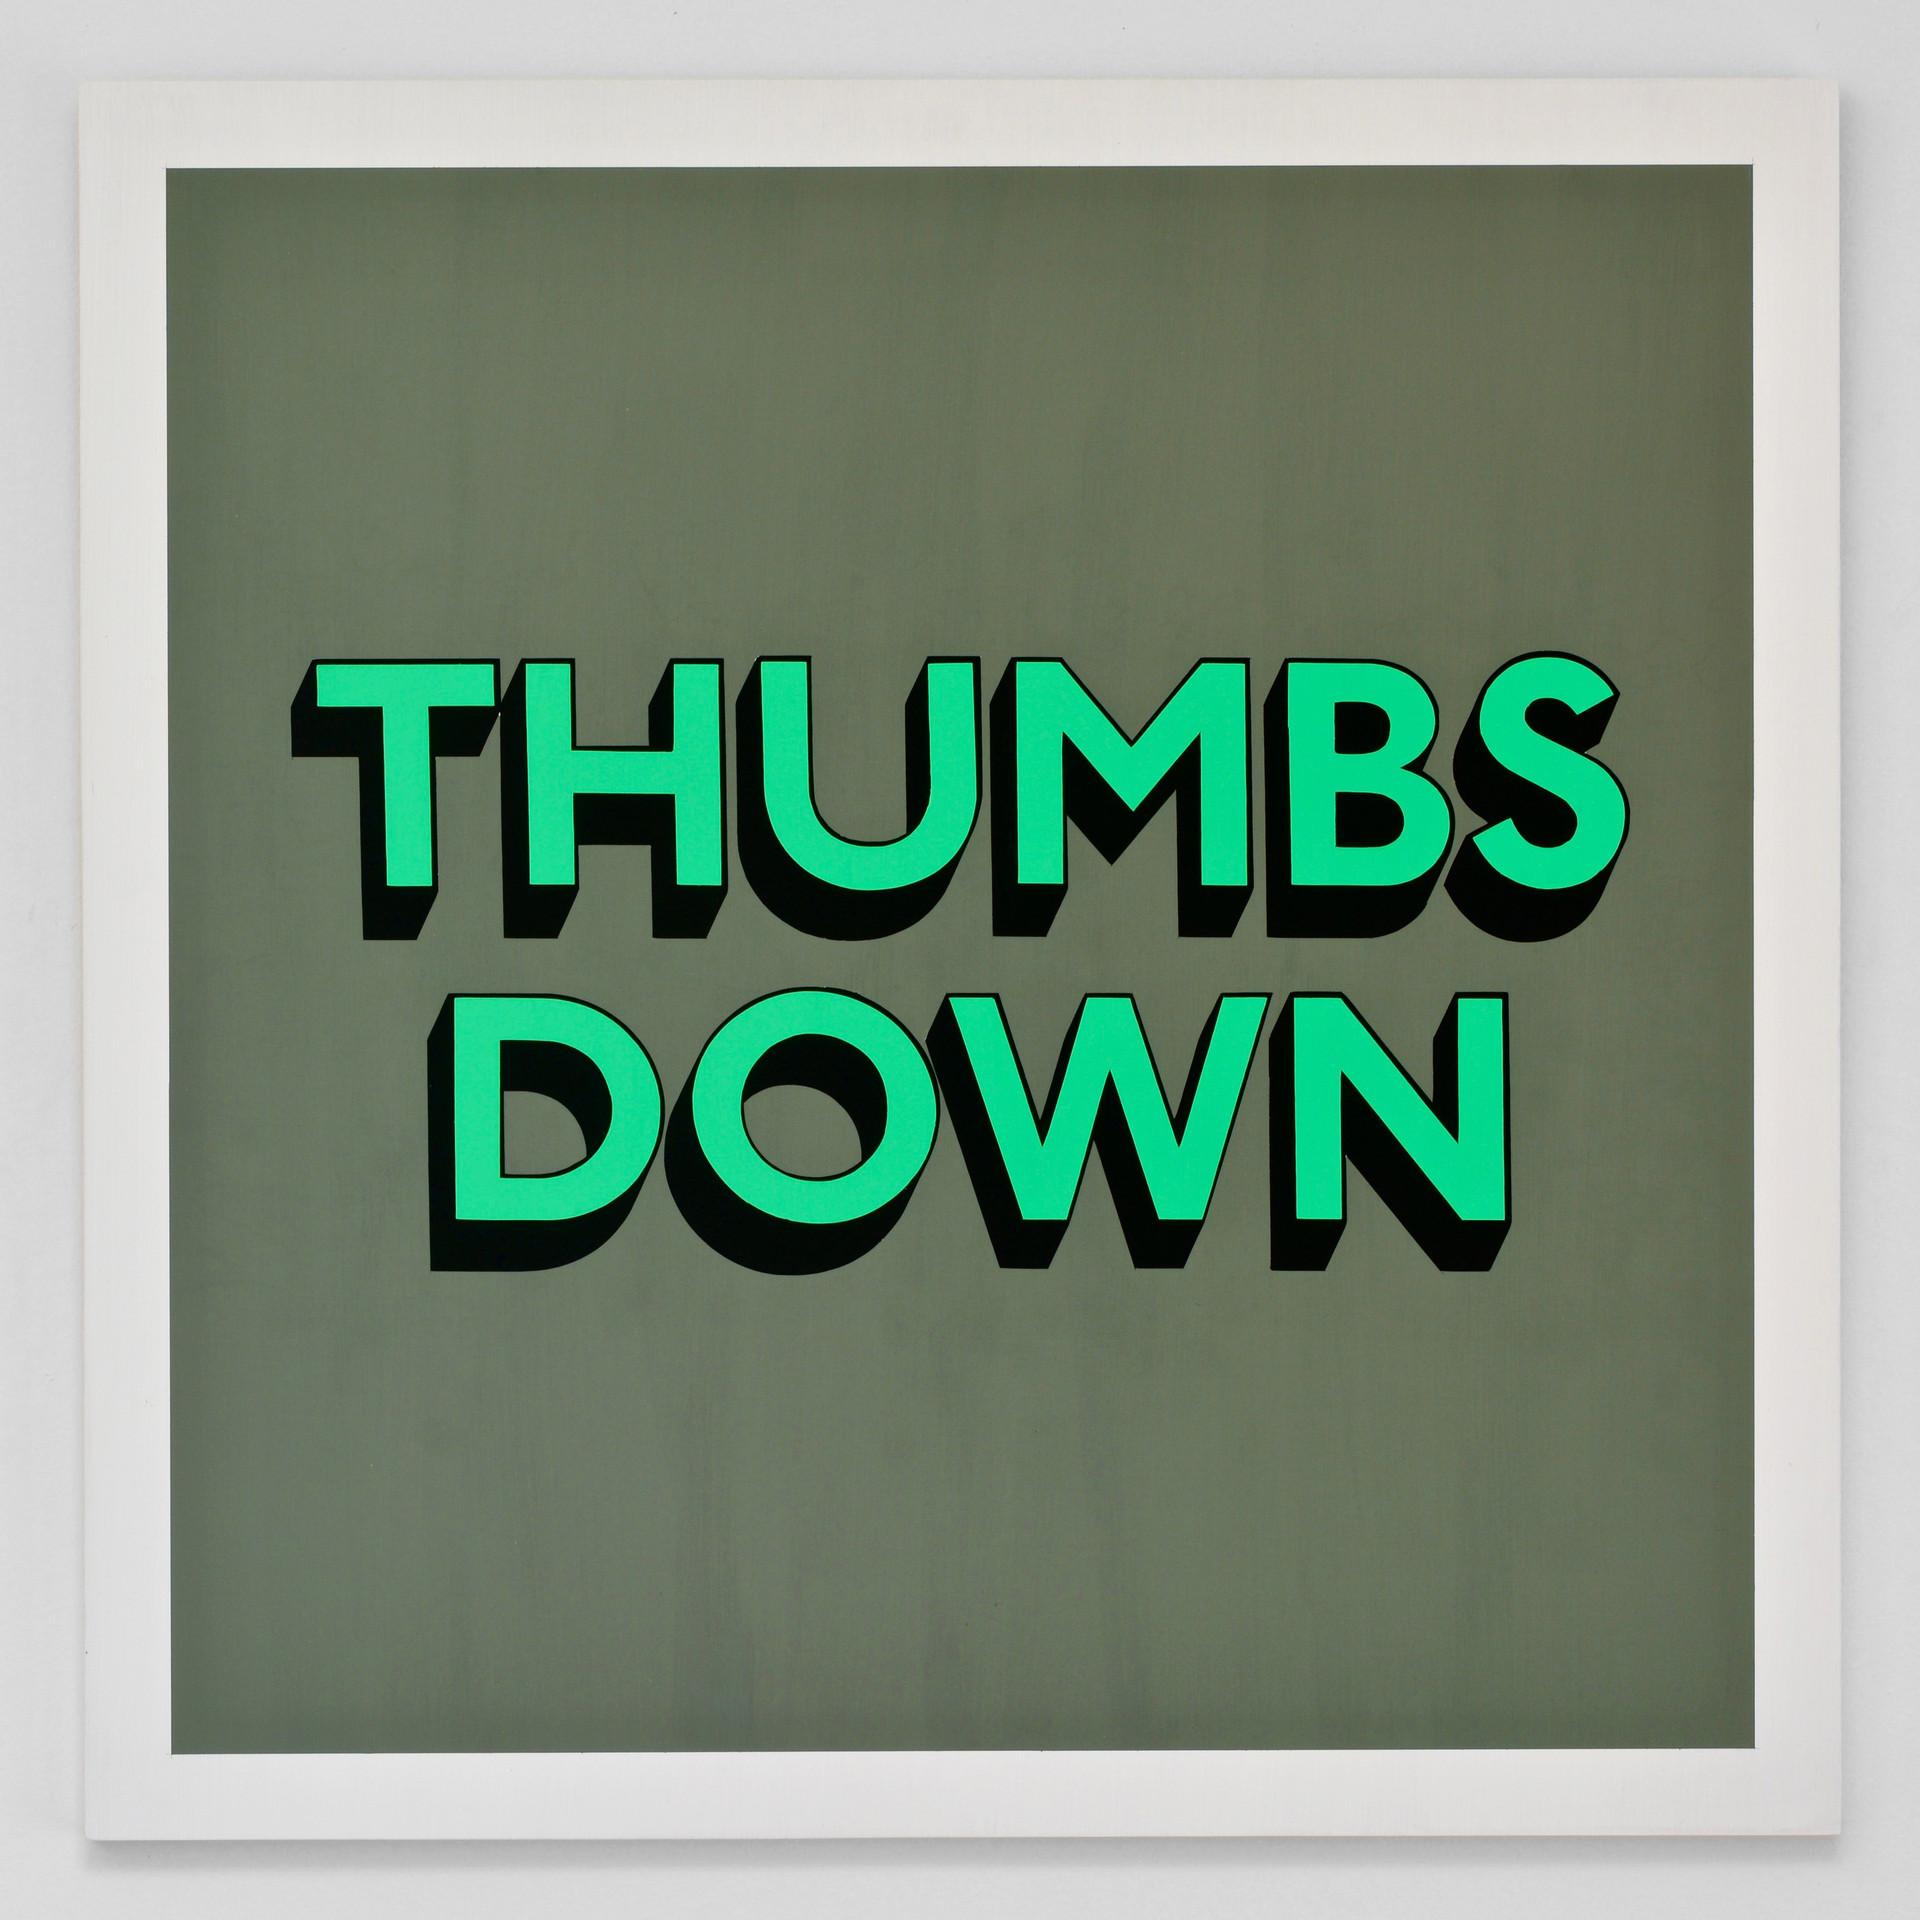 THUMBS_DOWN.jpg